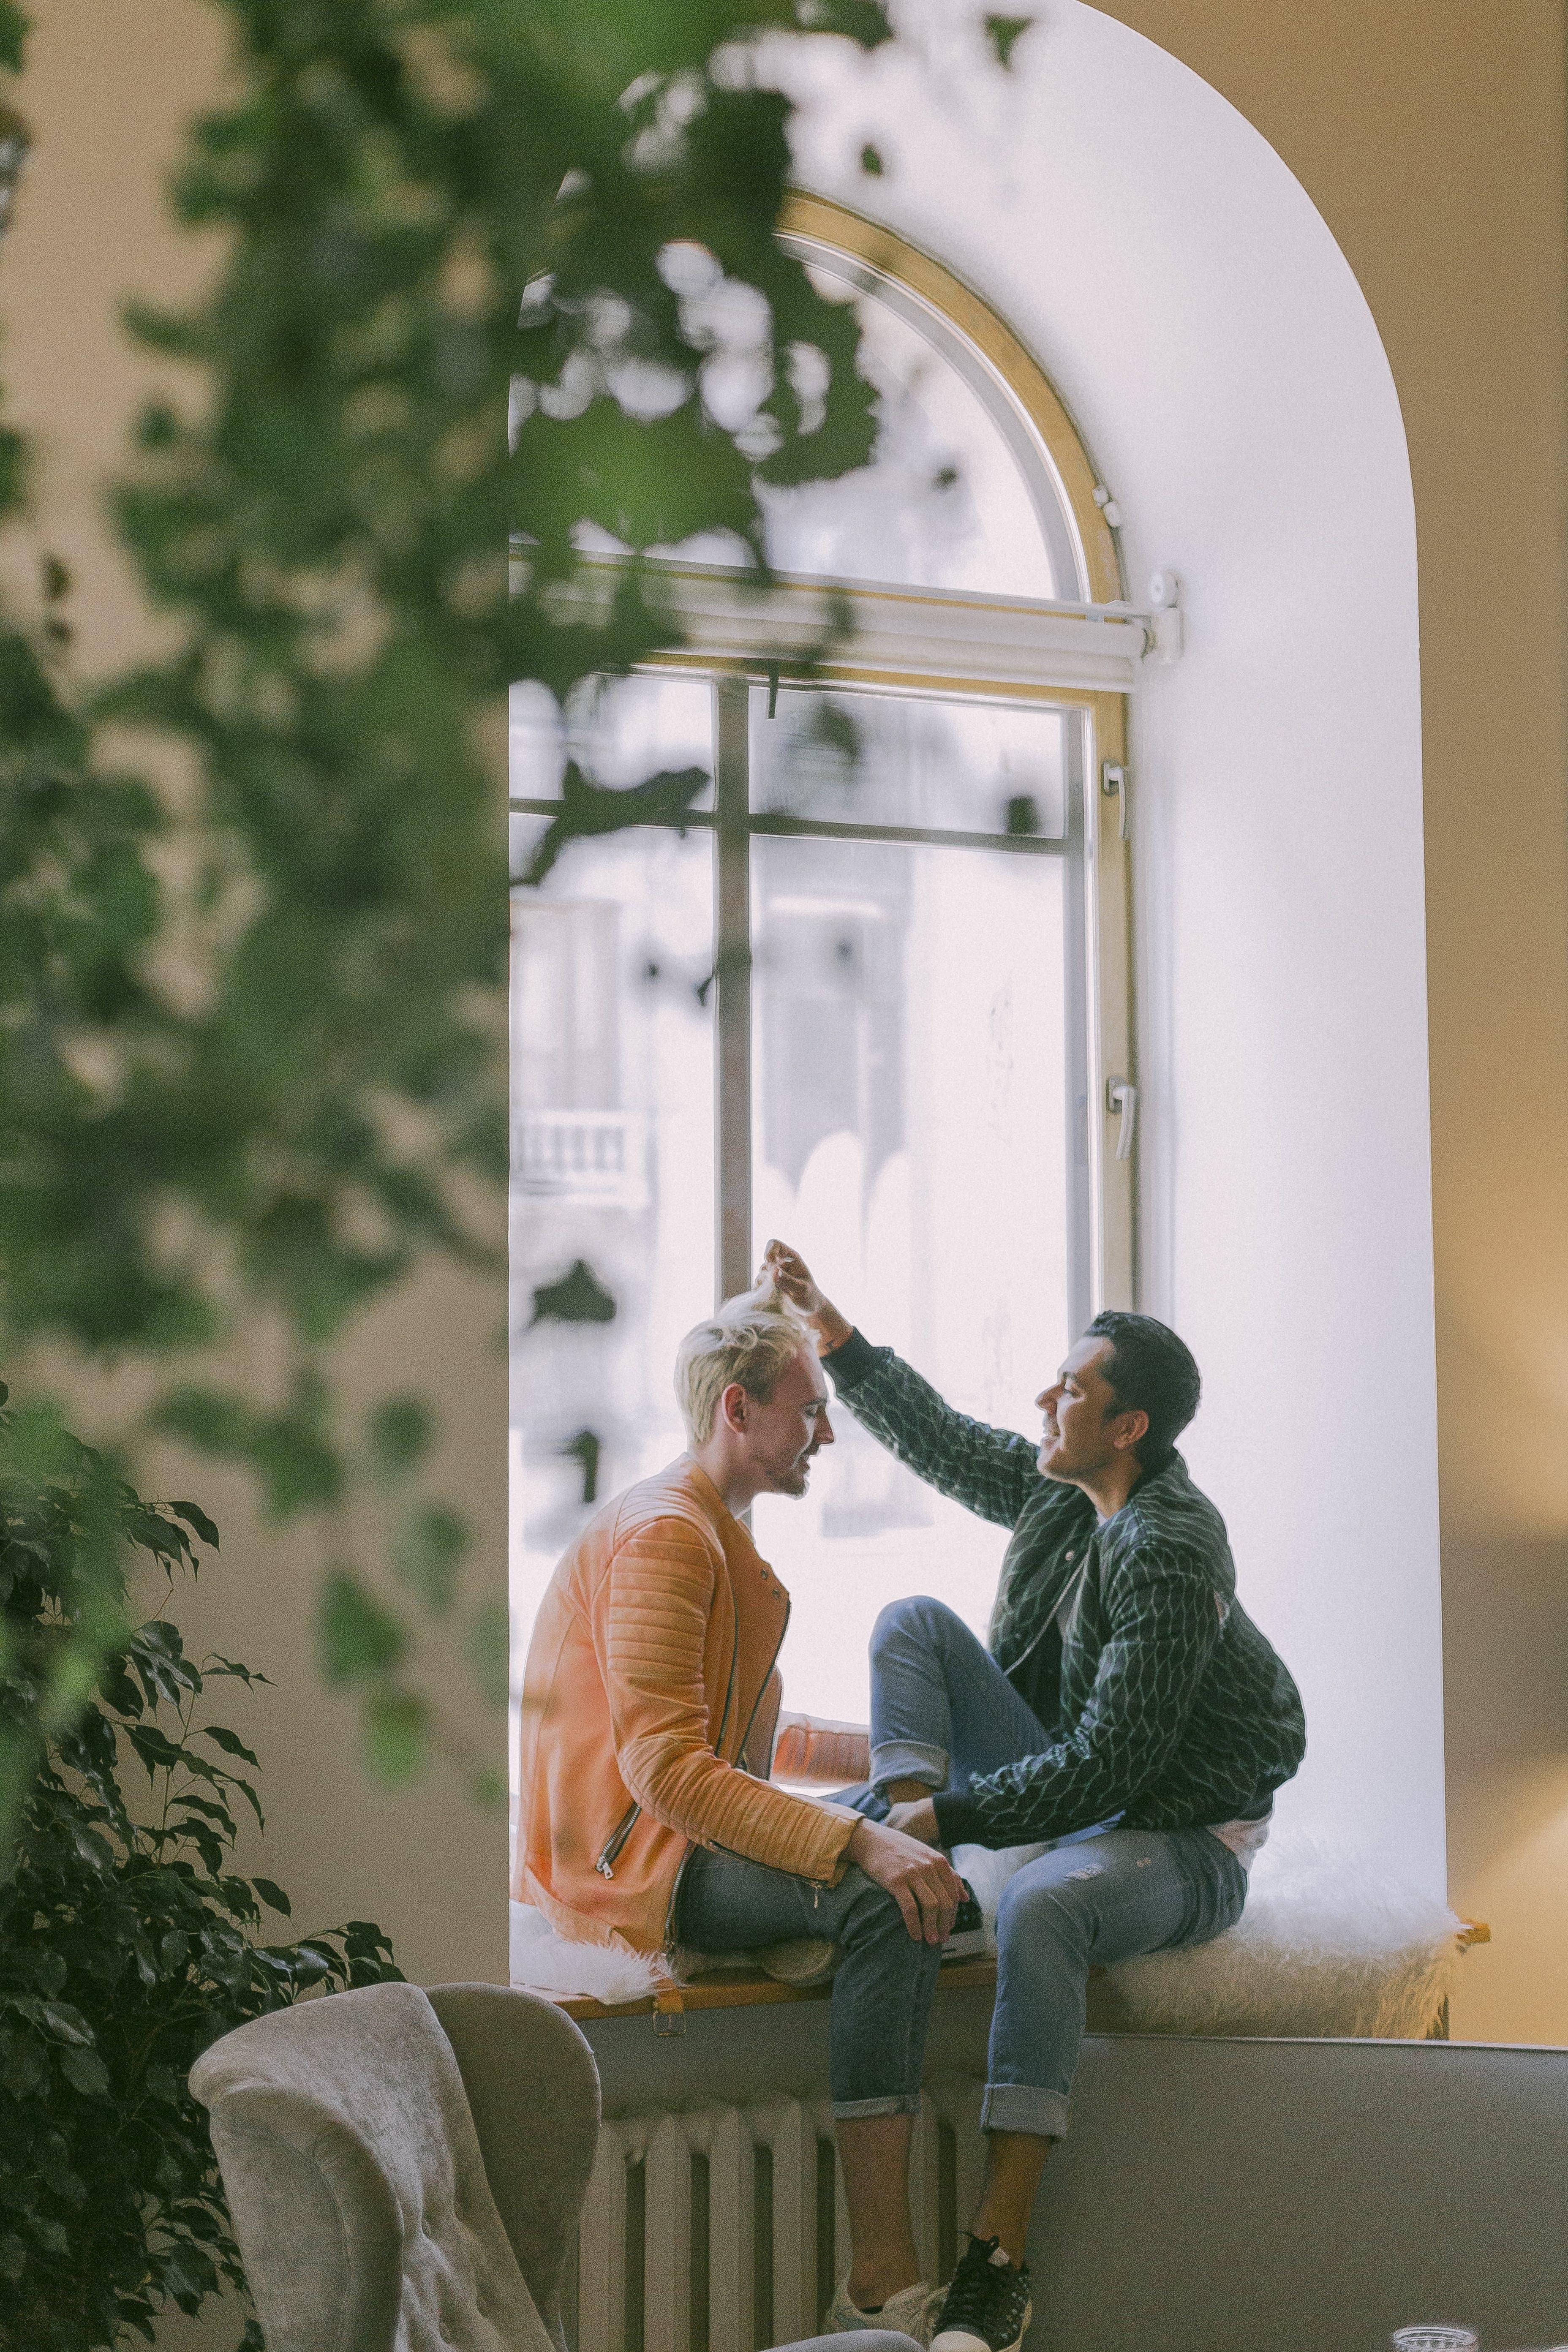 Man Wearing Green Jacket in Front of Man Wearing Orange Zip-up Jacket Sitting on Near the Window Photo